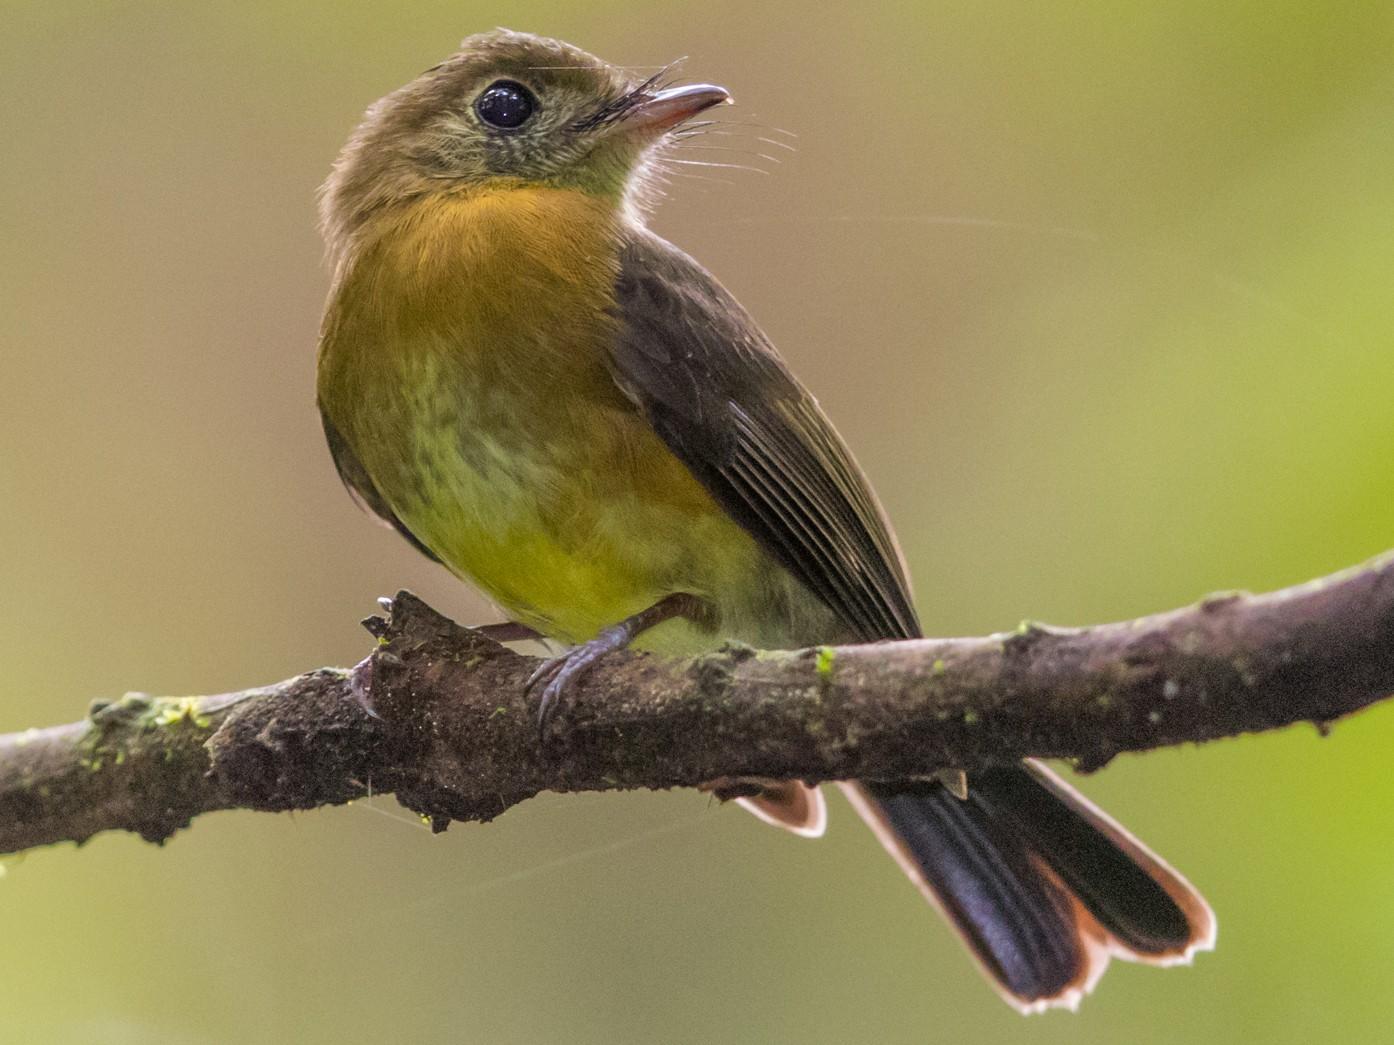 Sulphur-rumped Flycatcher - Soham Mehta